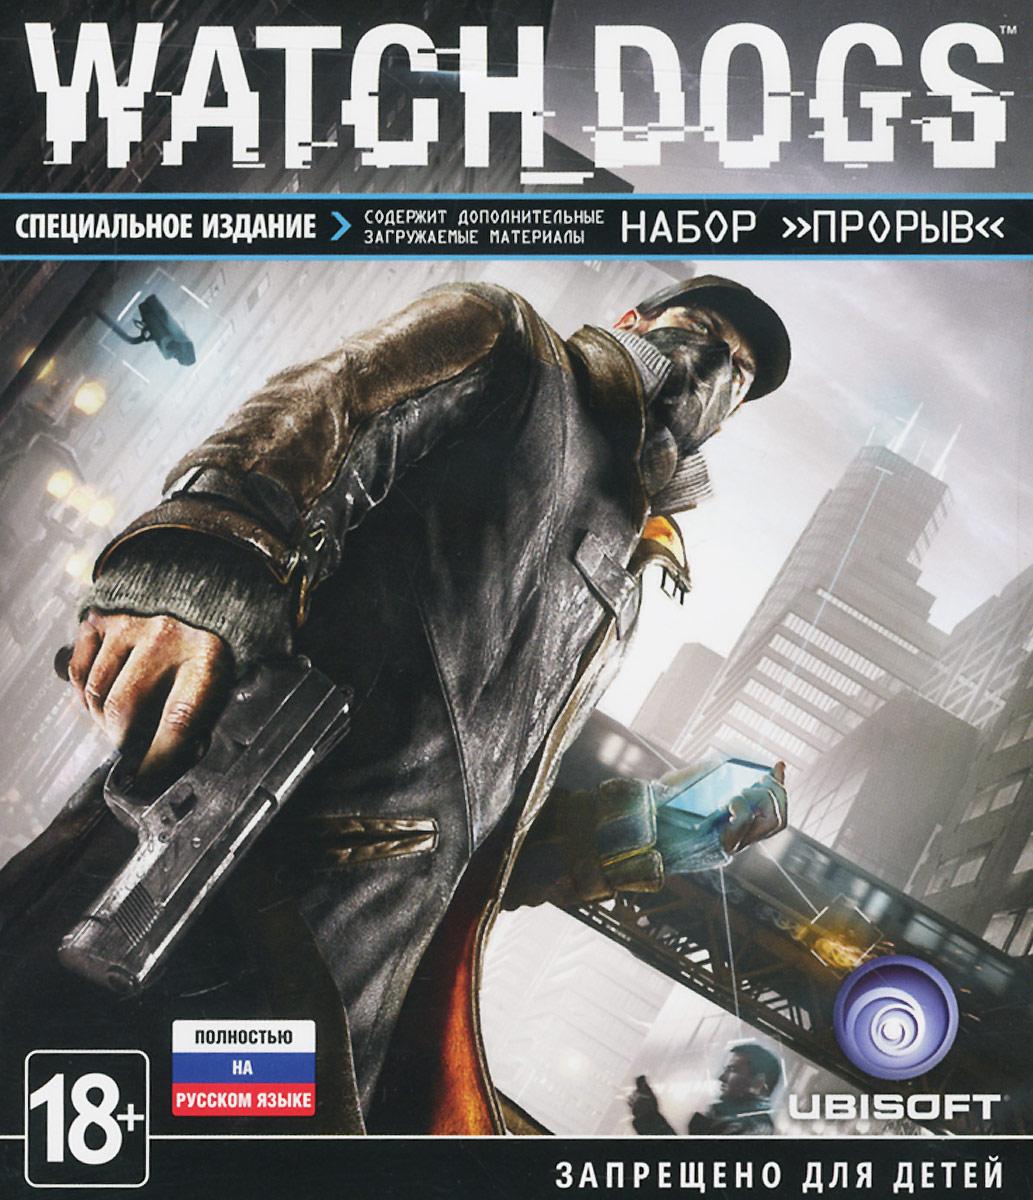 Watch Dogs. Специальное издание (Xbox One)